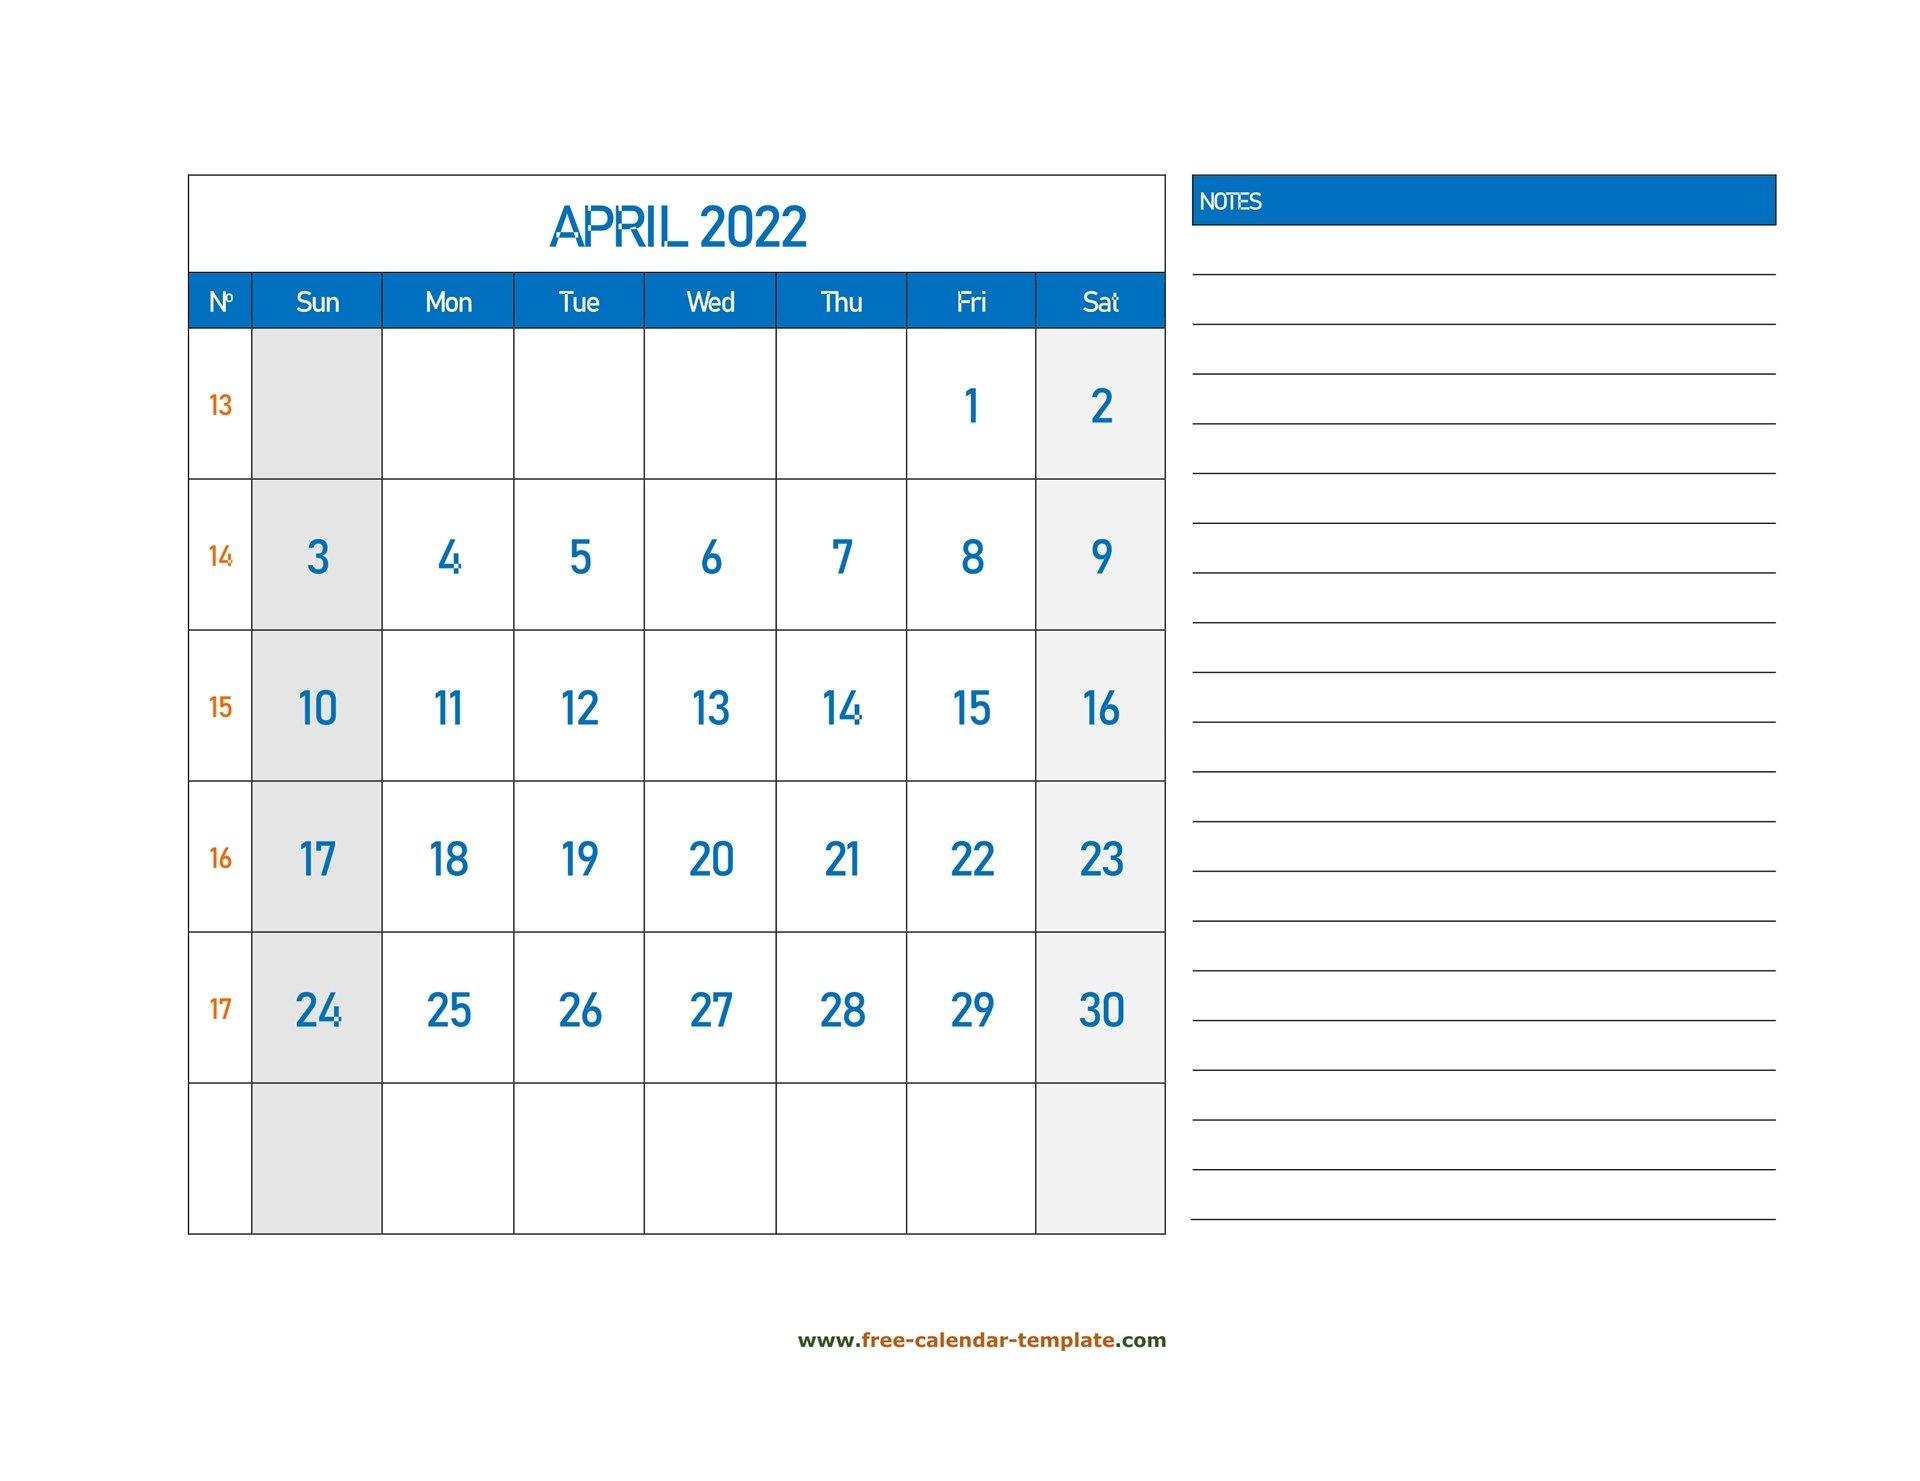 April Calendar 2022 Grid Lines For Holidays And Notes regarding Calendar April 2022 Printable Pdf Graphics